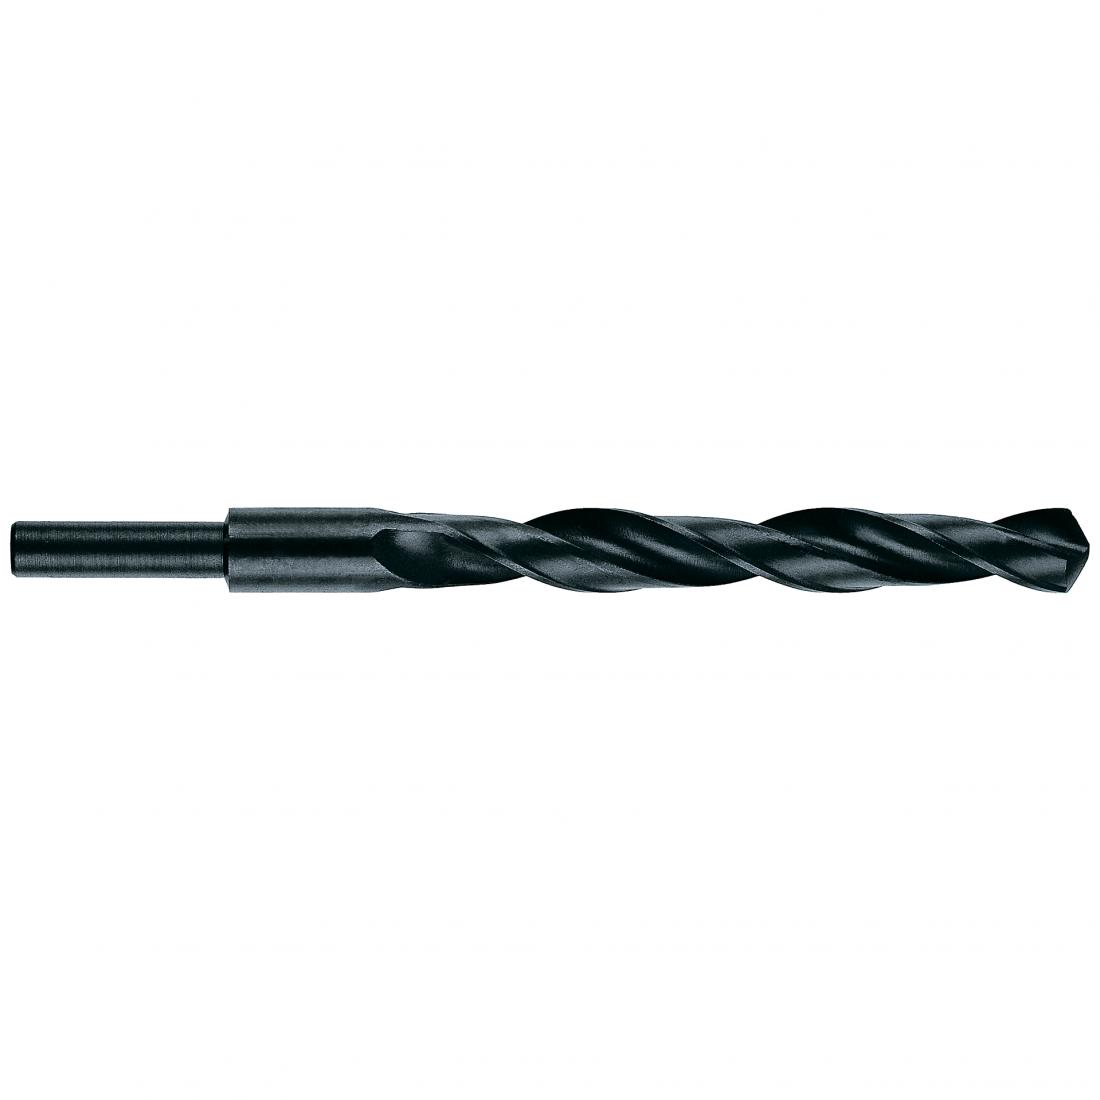 Сверло по металлу Heller HSS cо ступенчатым хвостовиком 25х150х246мм